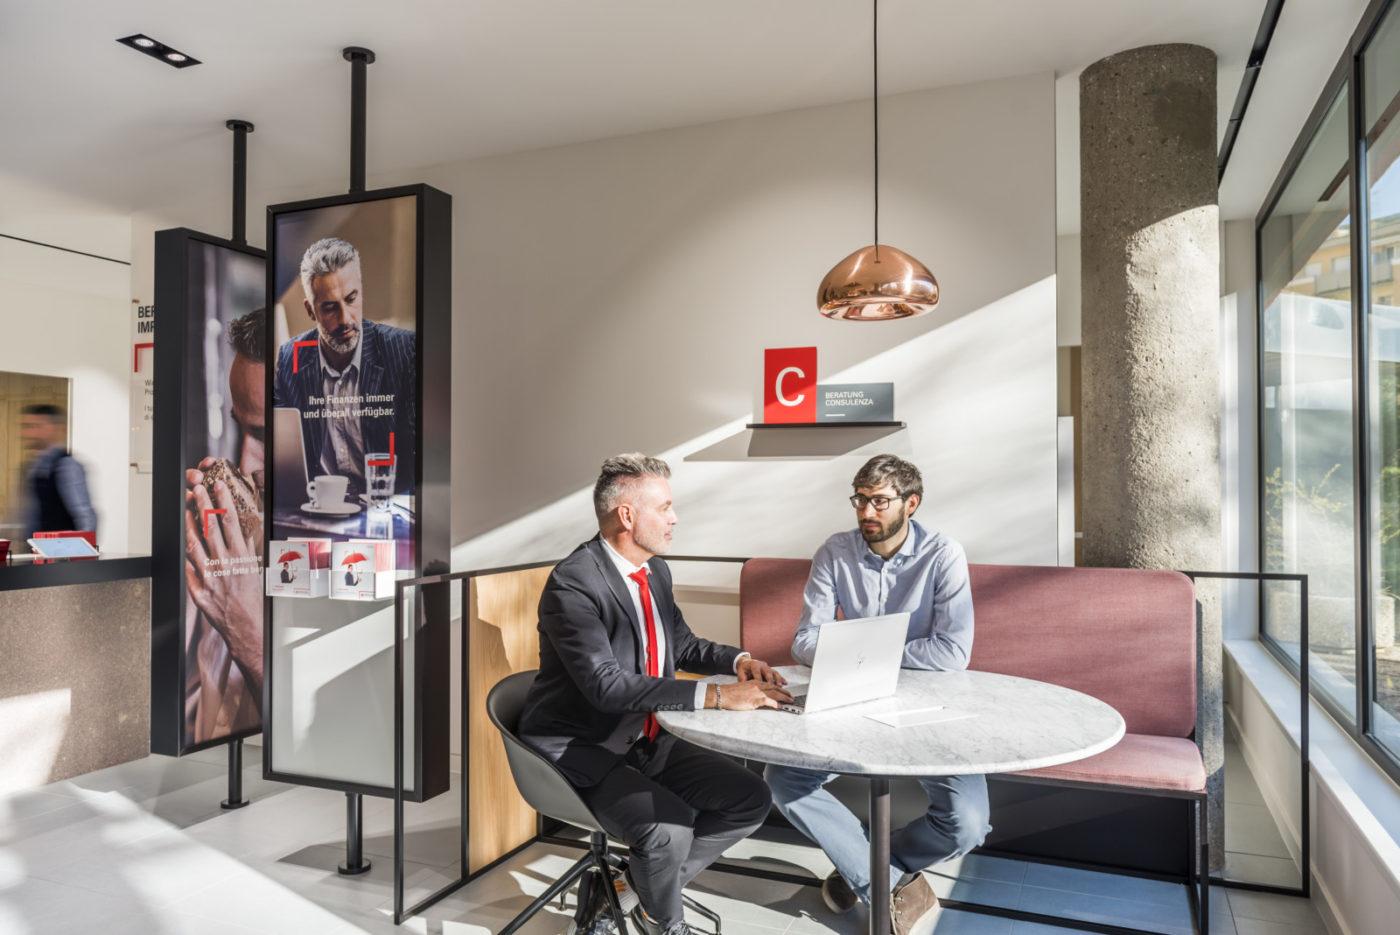 La nuova filiale Sparkasse a Bolzano